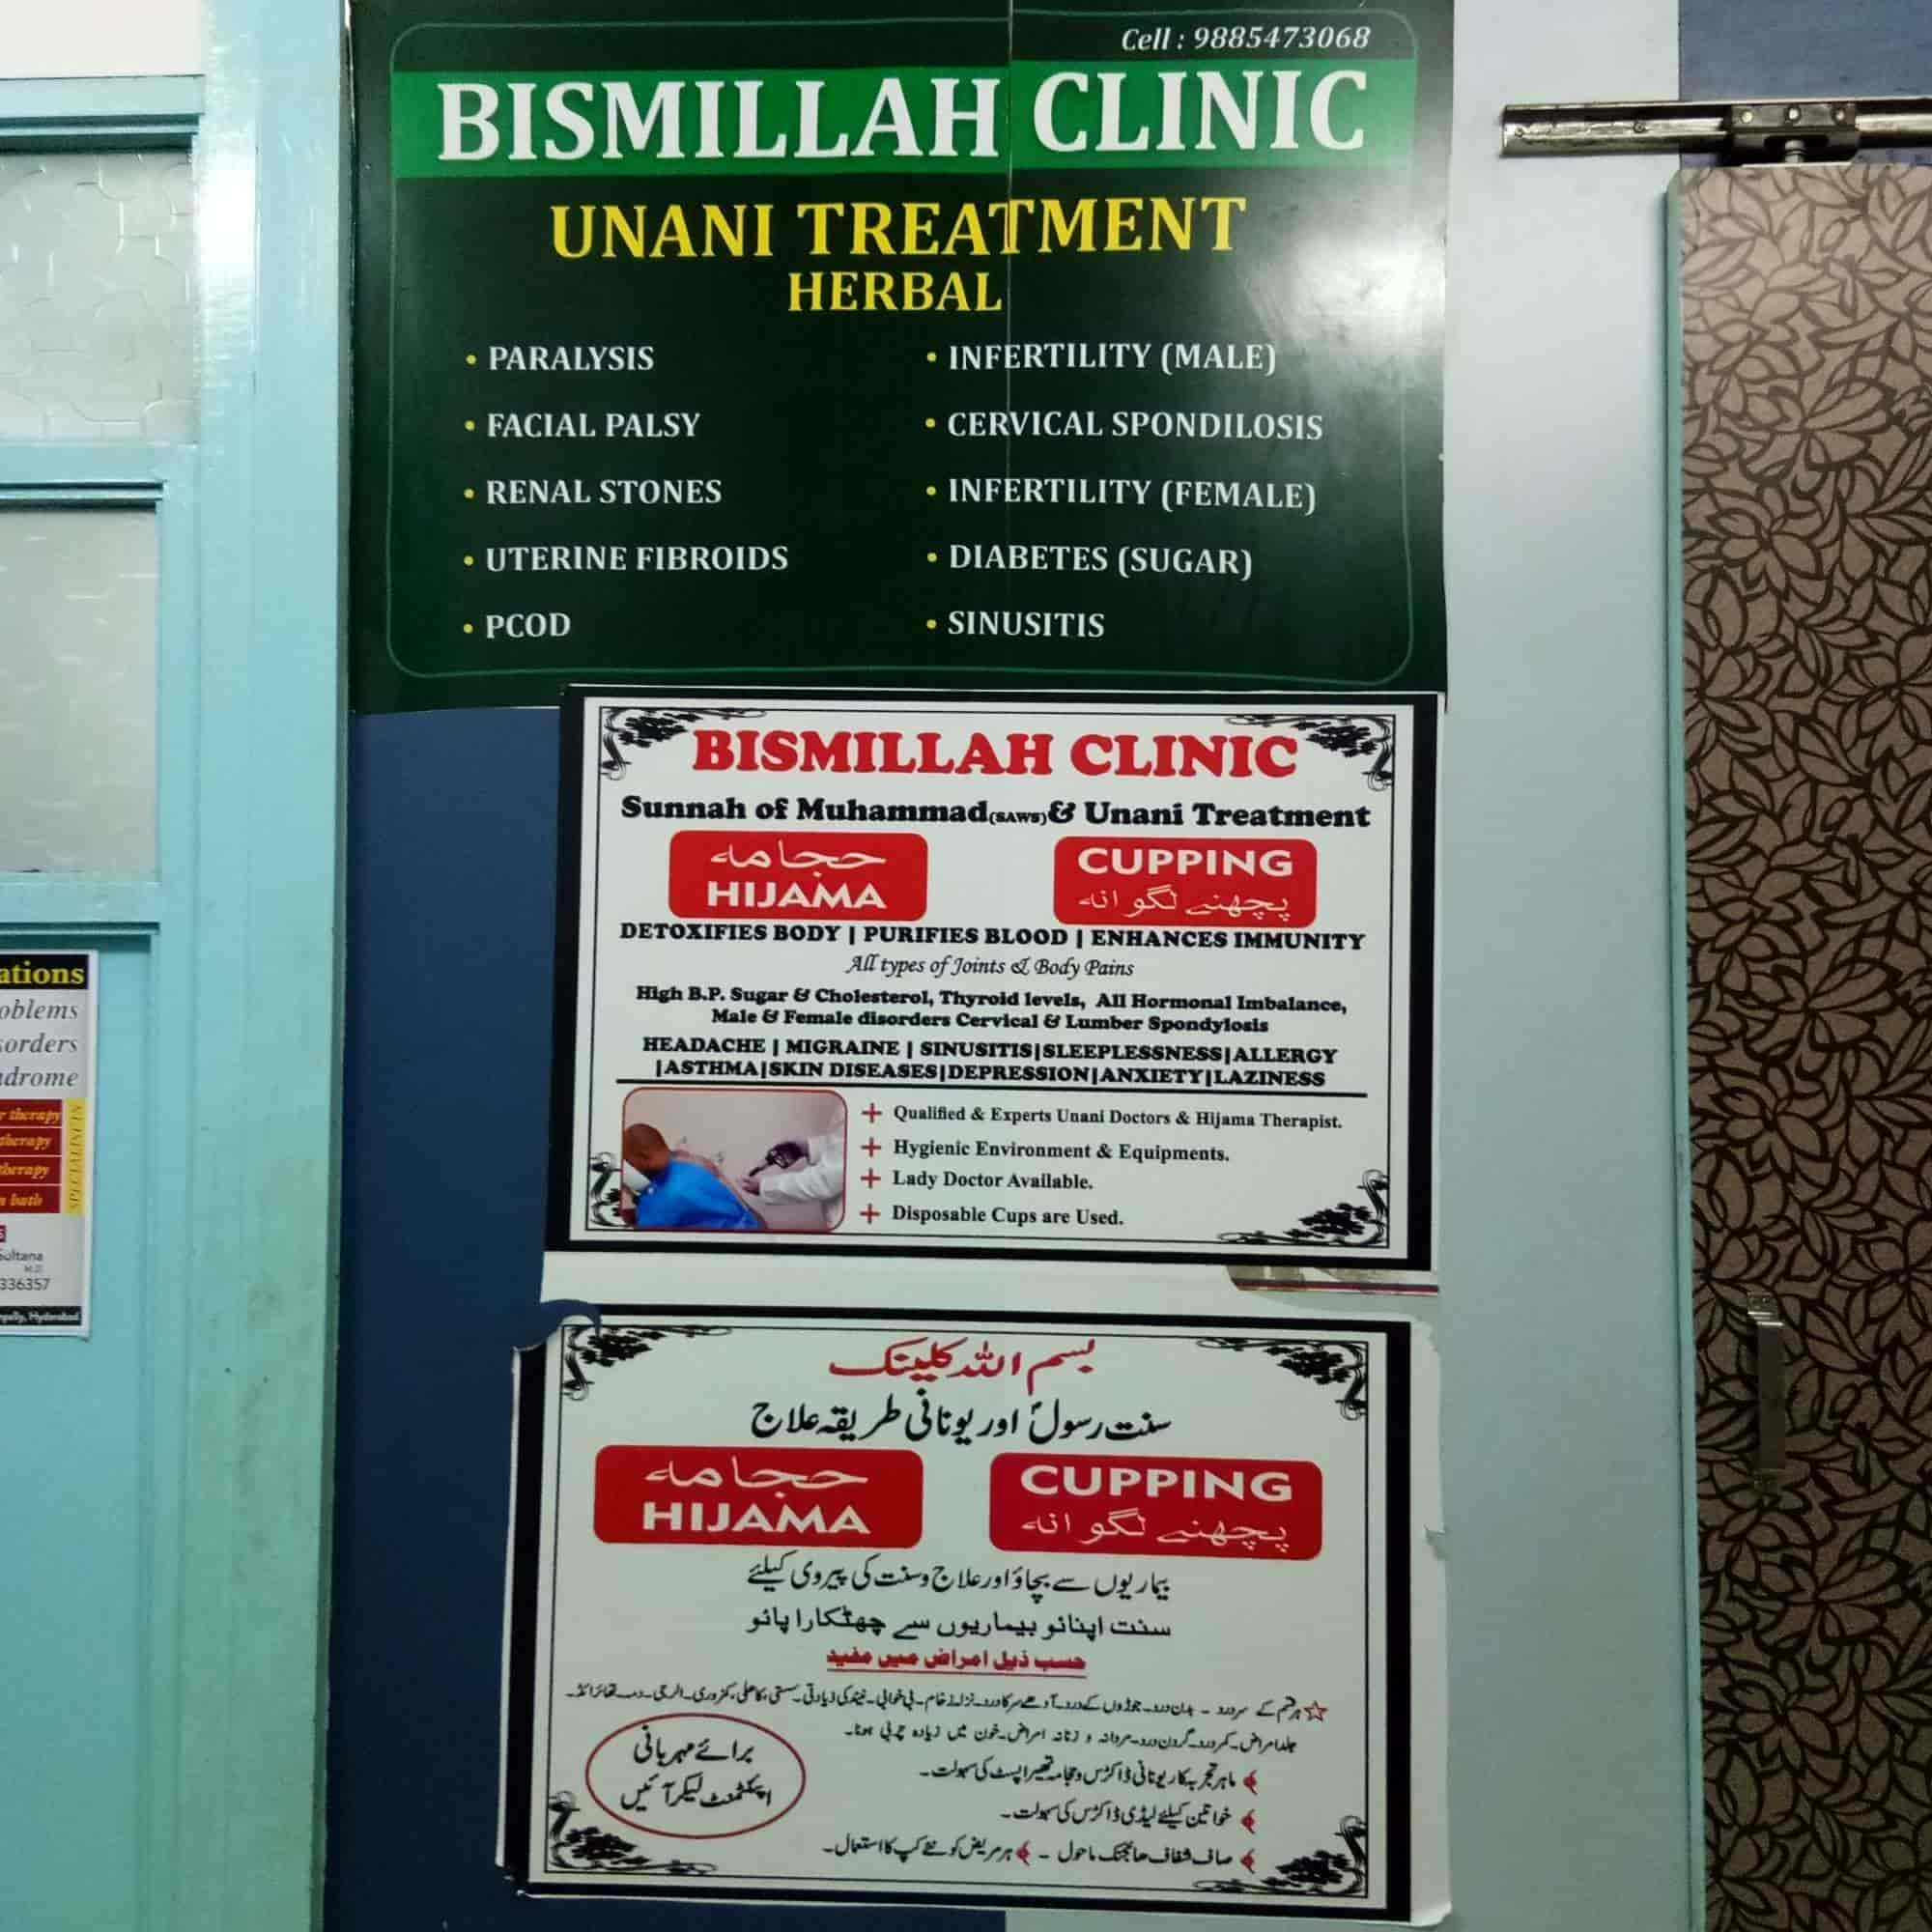 Dr  S A Rahman's Bismillah Unani Clinic, Abids - Unani